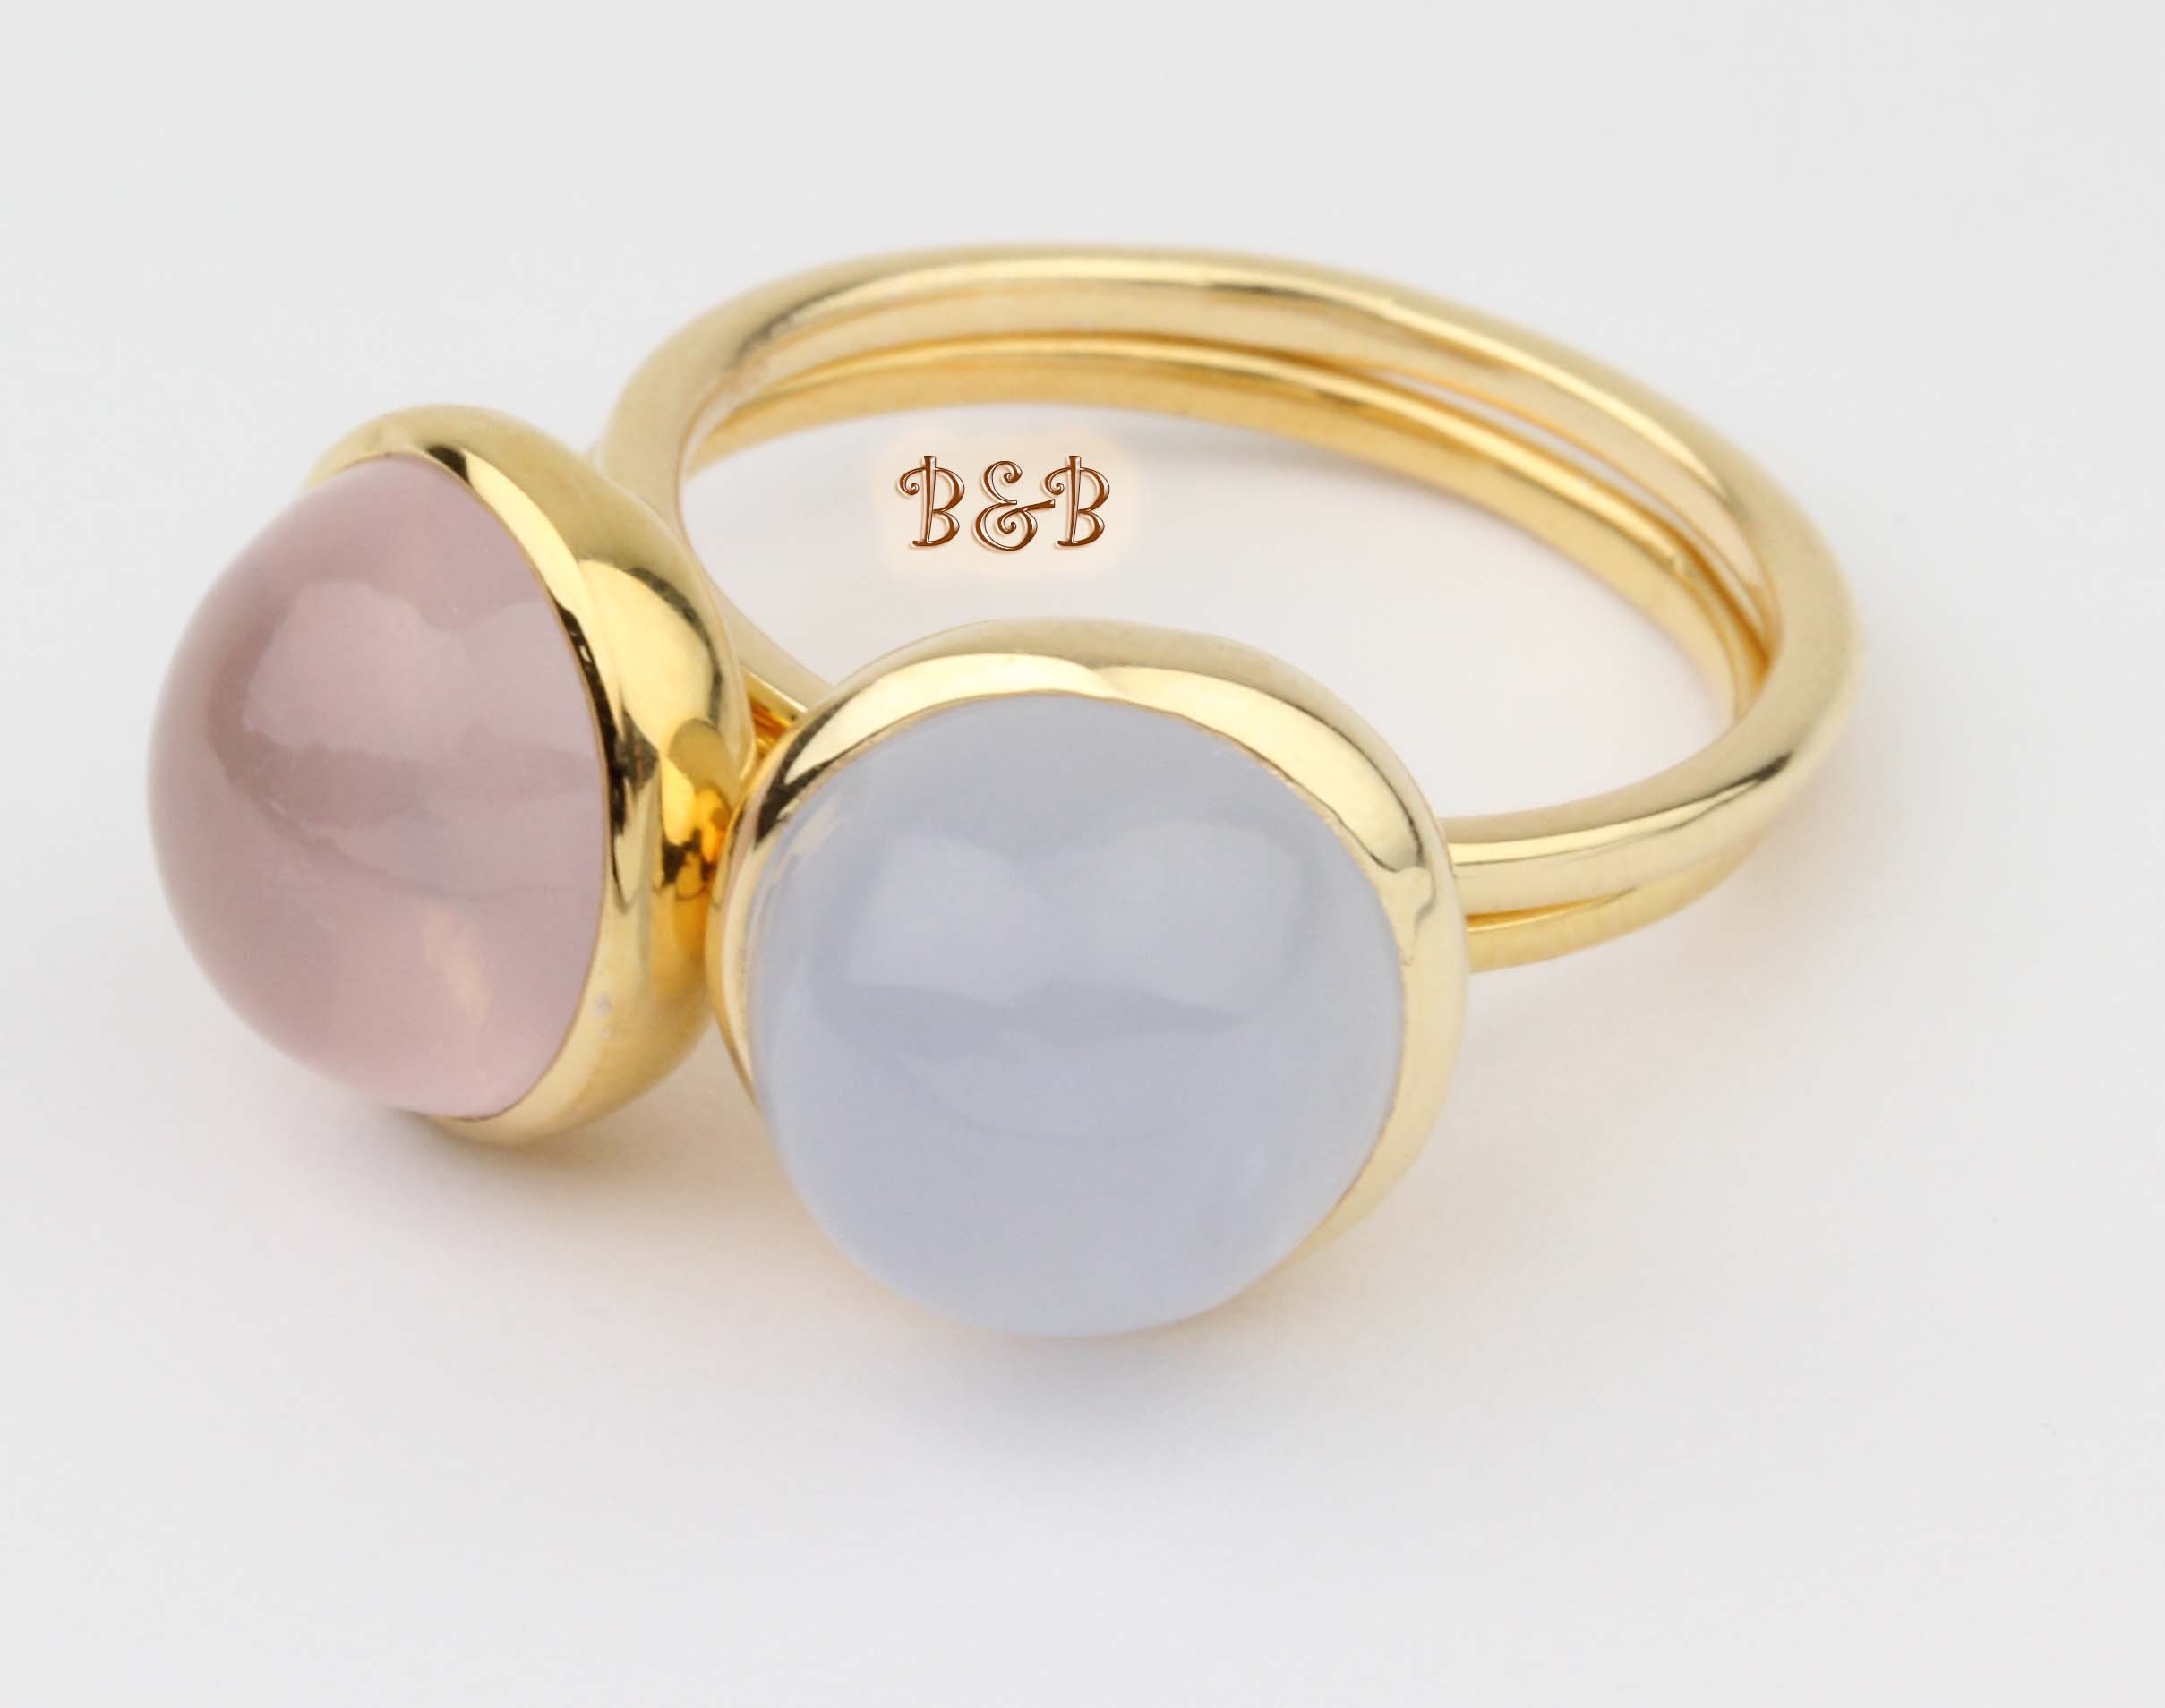 Silver ring_B&B_1873